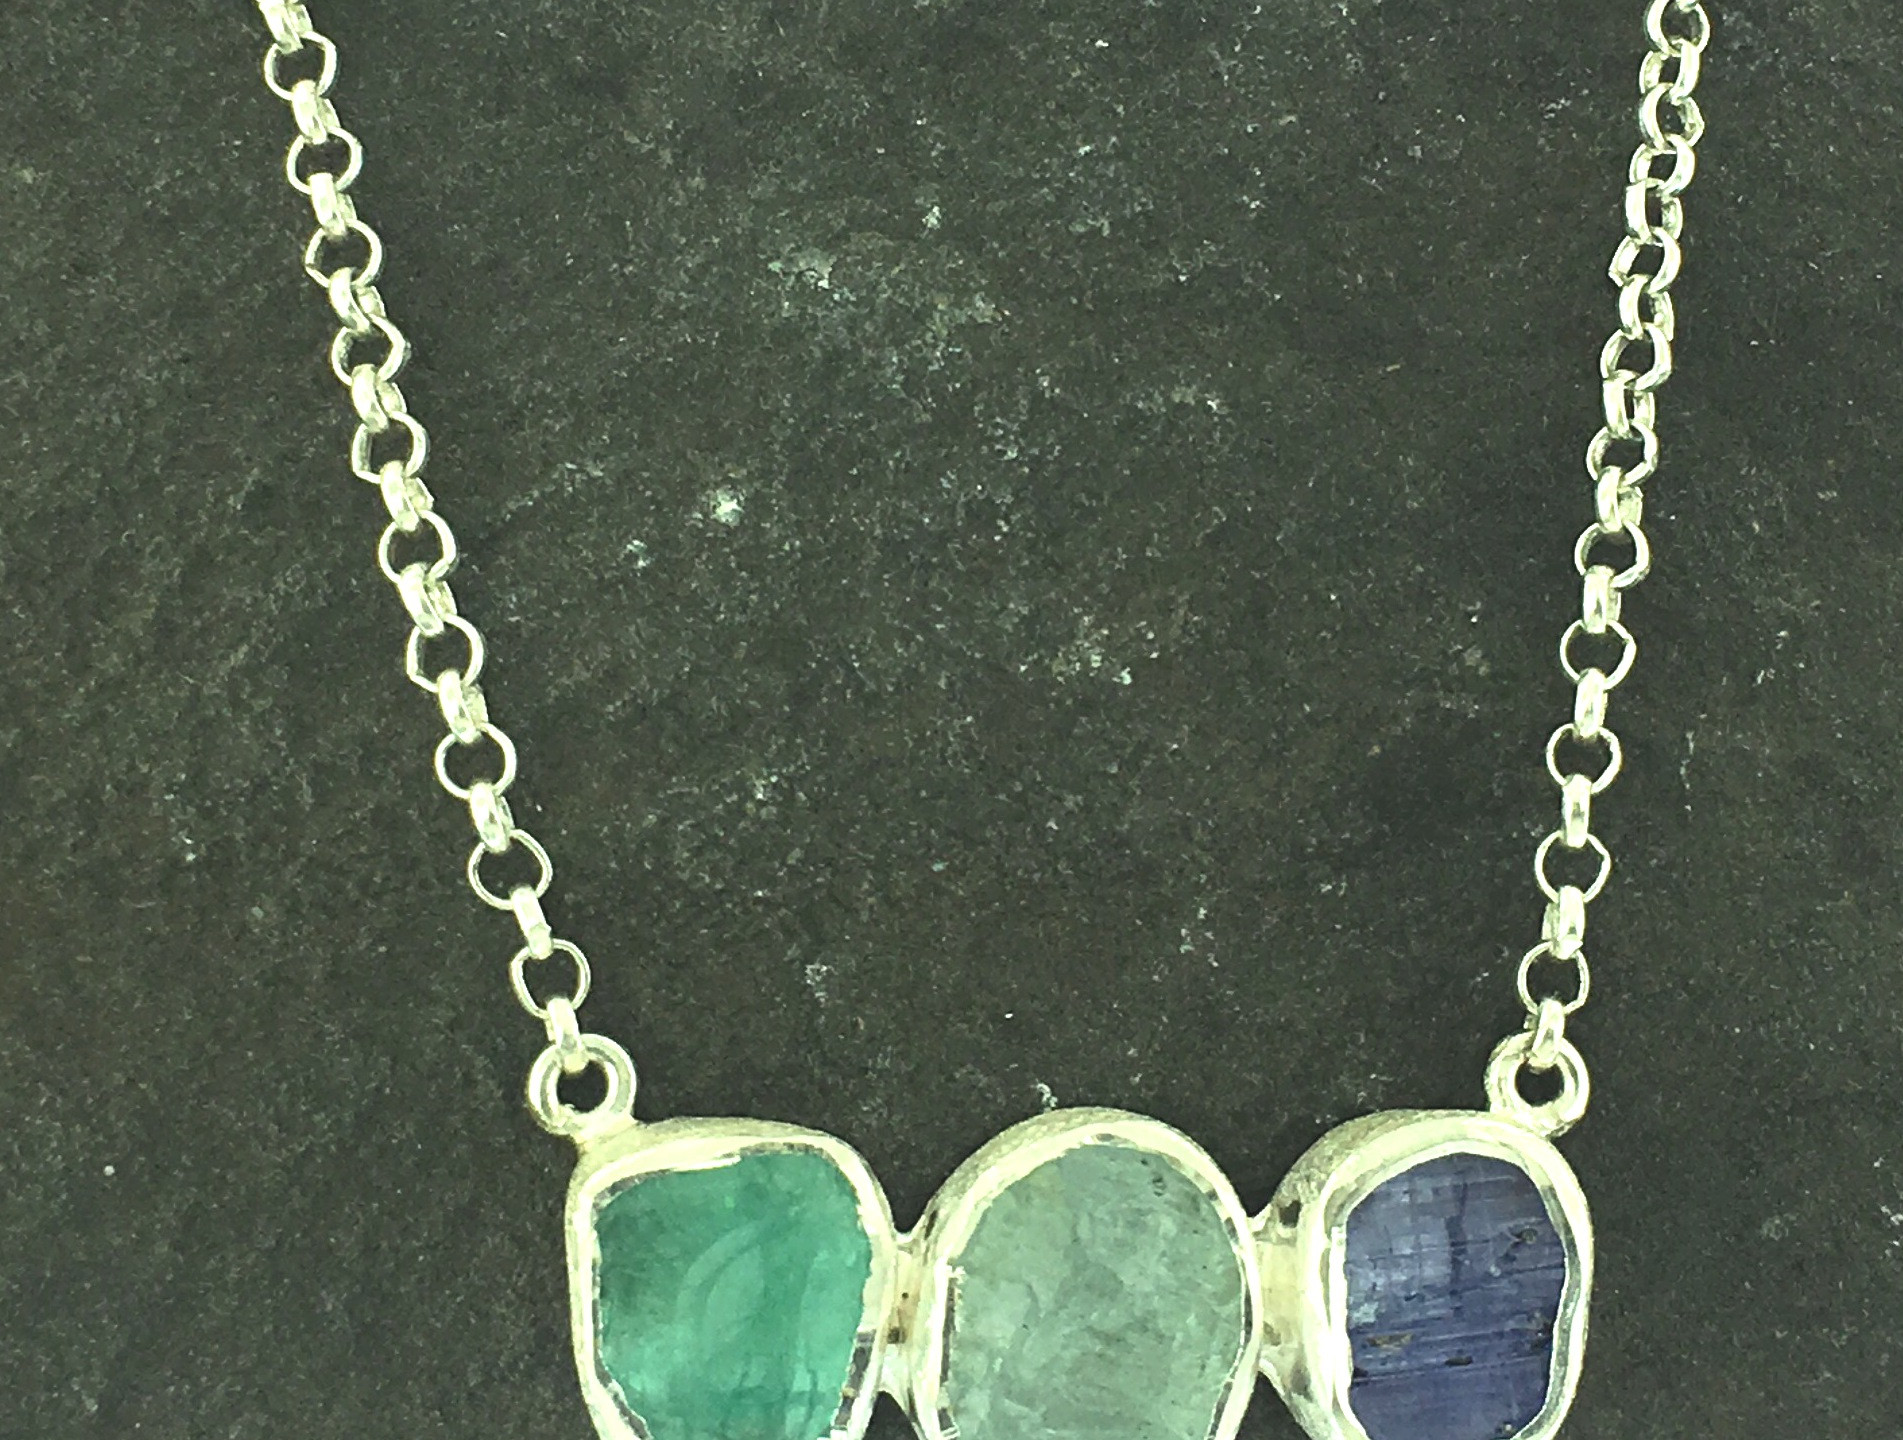 Rough gemstone necklace